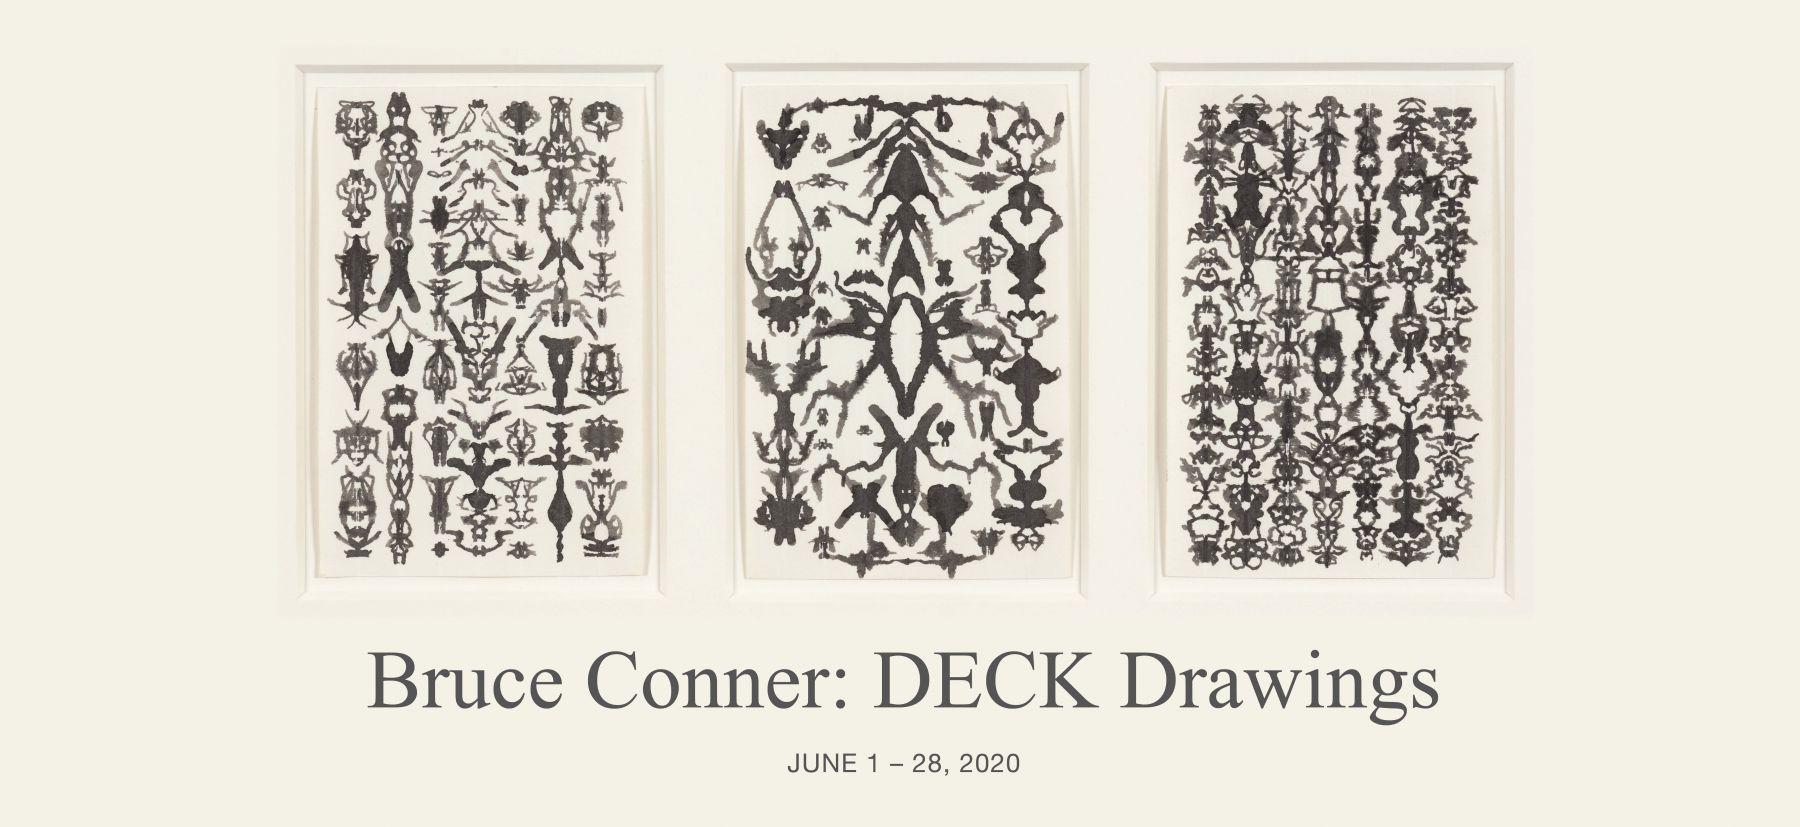 Bruce Conner TRIO 52-19-1, 1975 ink each card: 6 x 4 in. (15.2 x 10.2 cm) frame: 13 1/4 x 21 1/4 in. (33.7 x 54 cm)